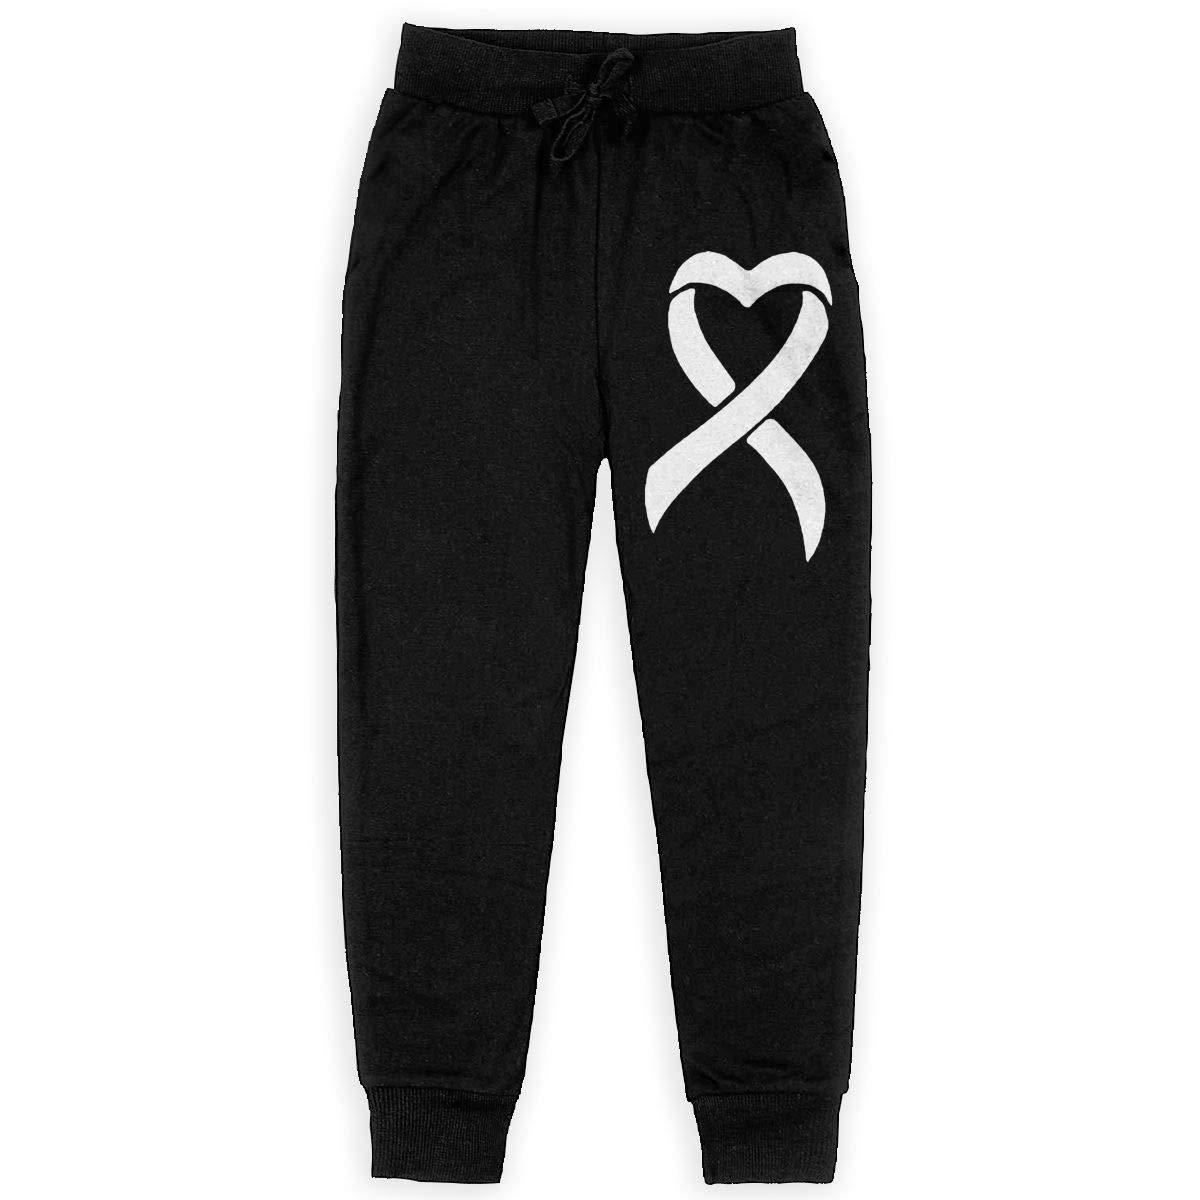 Kly Pants Lung Cancer Ribbon Youth Sweatpants Athletic Sweatpants Jogger Sweatpant